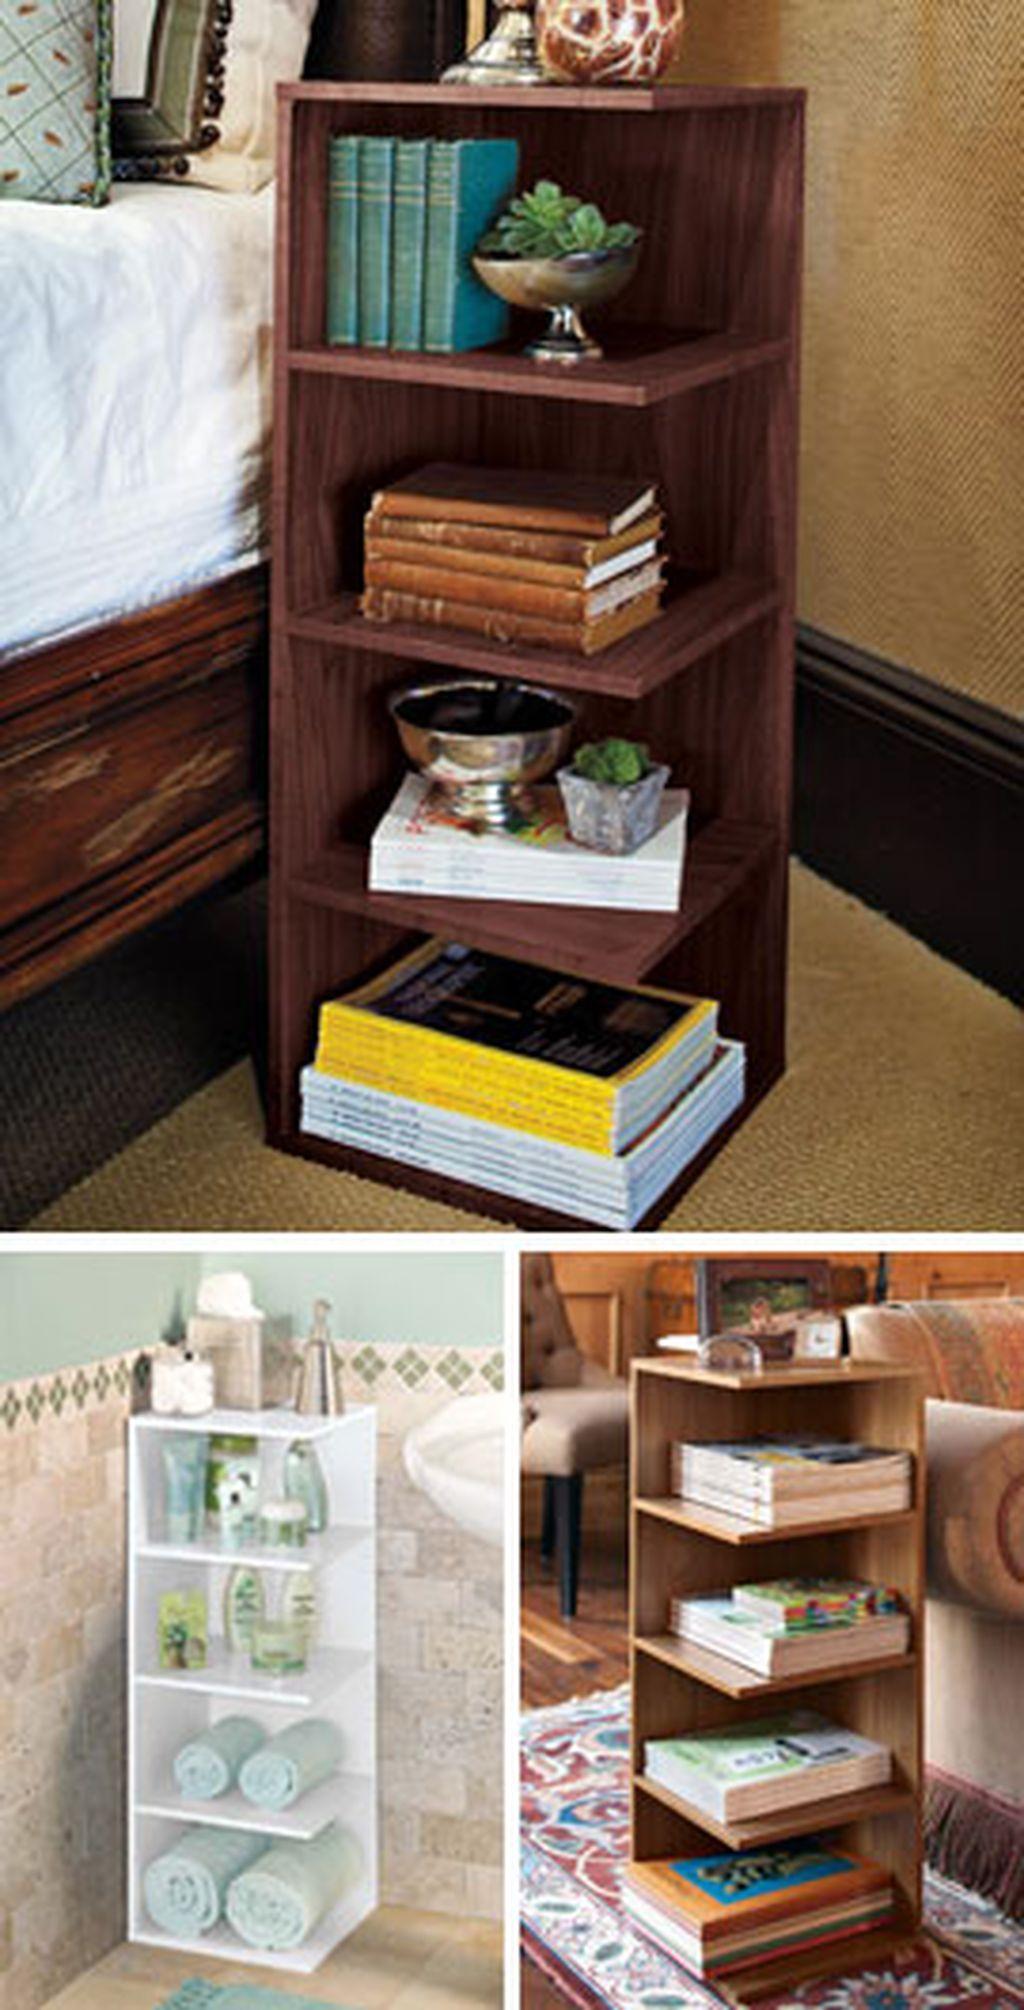 74 Brilliant Bookshelf Design Ideas for Small Space You ...